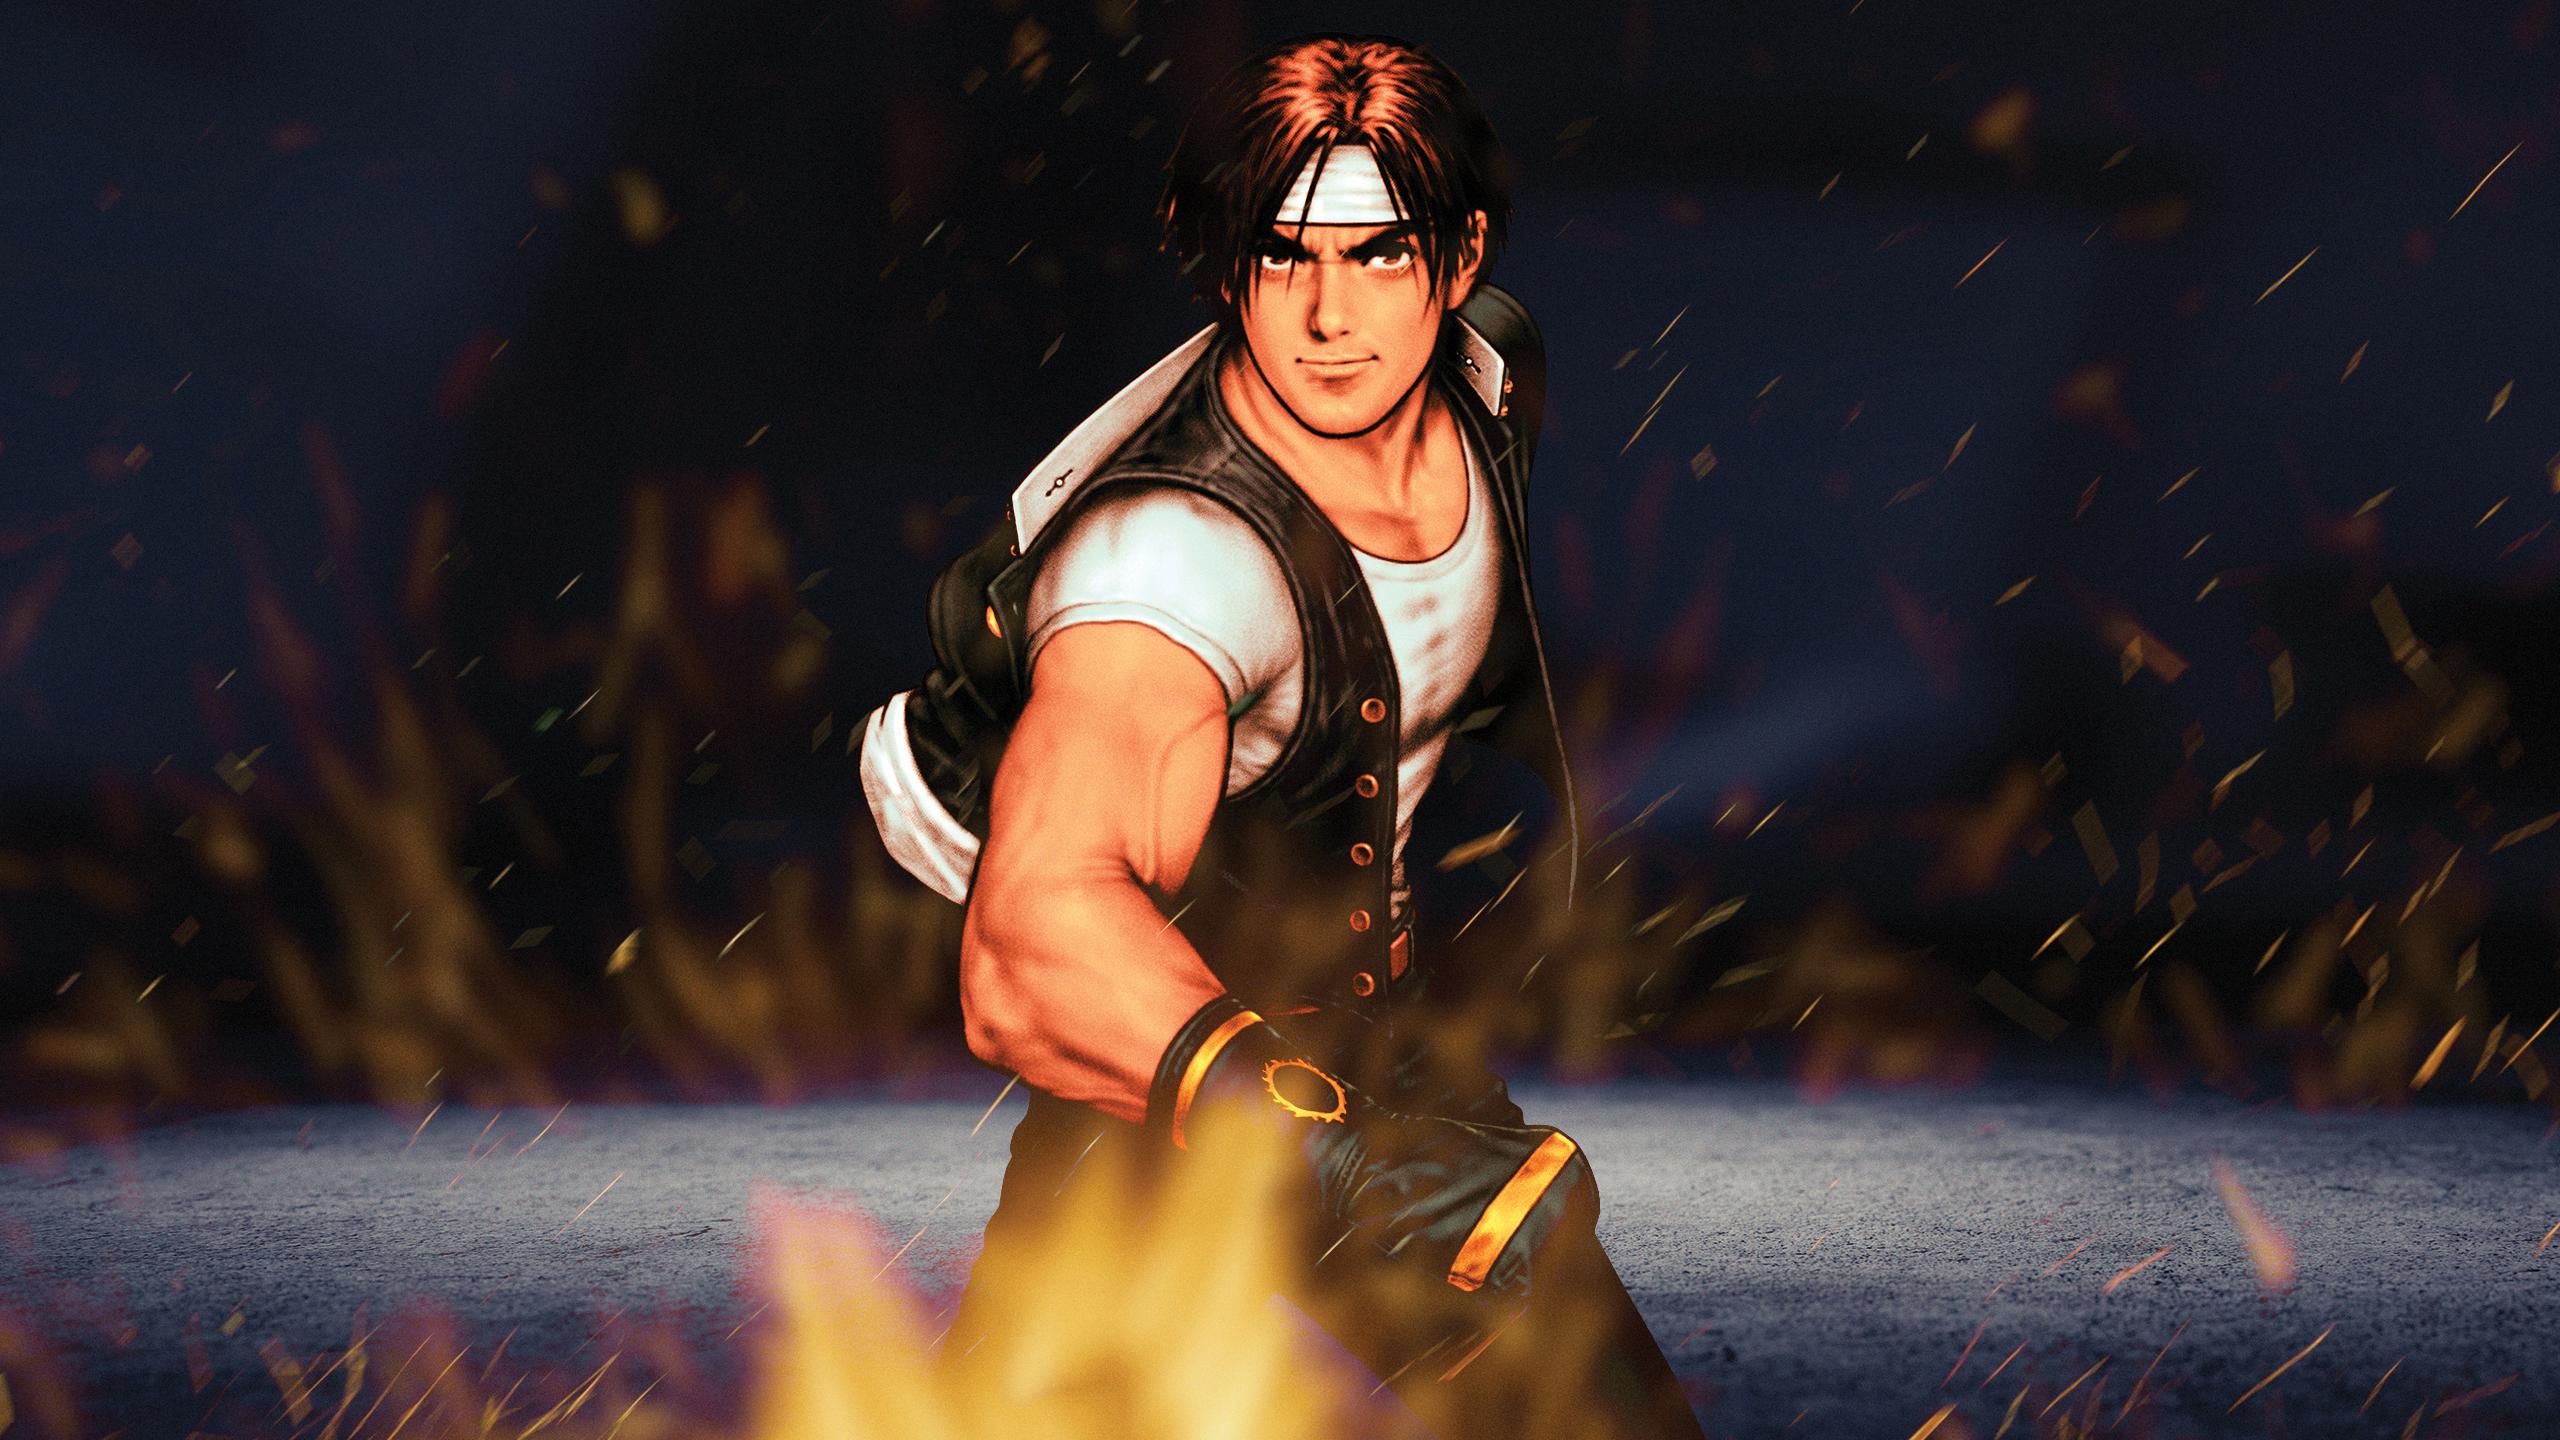 Wallpaper King Of Fighters Kyo Kusanagi 2560x1440